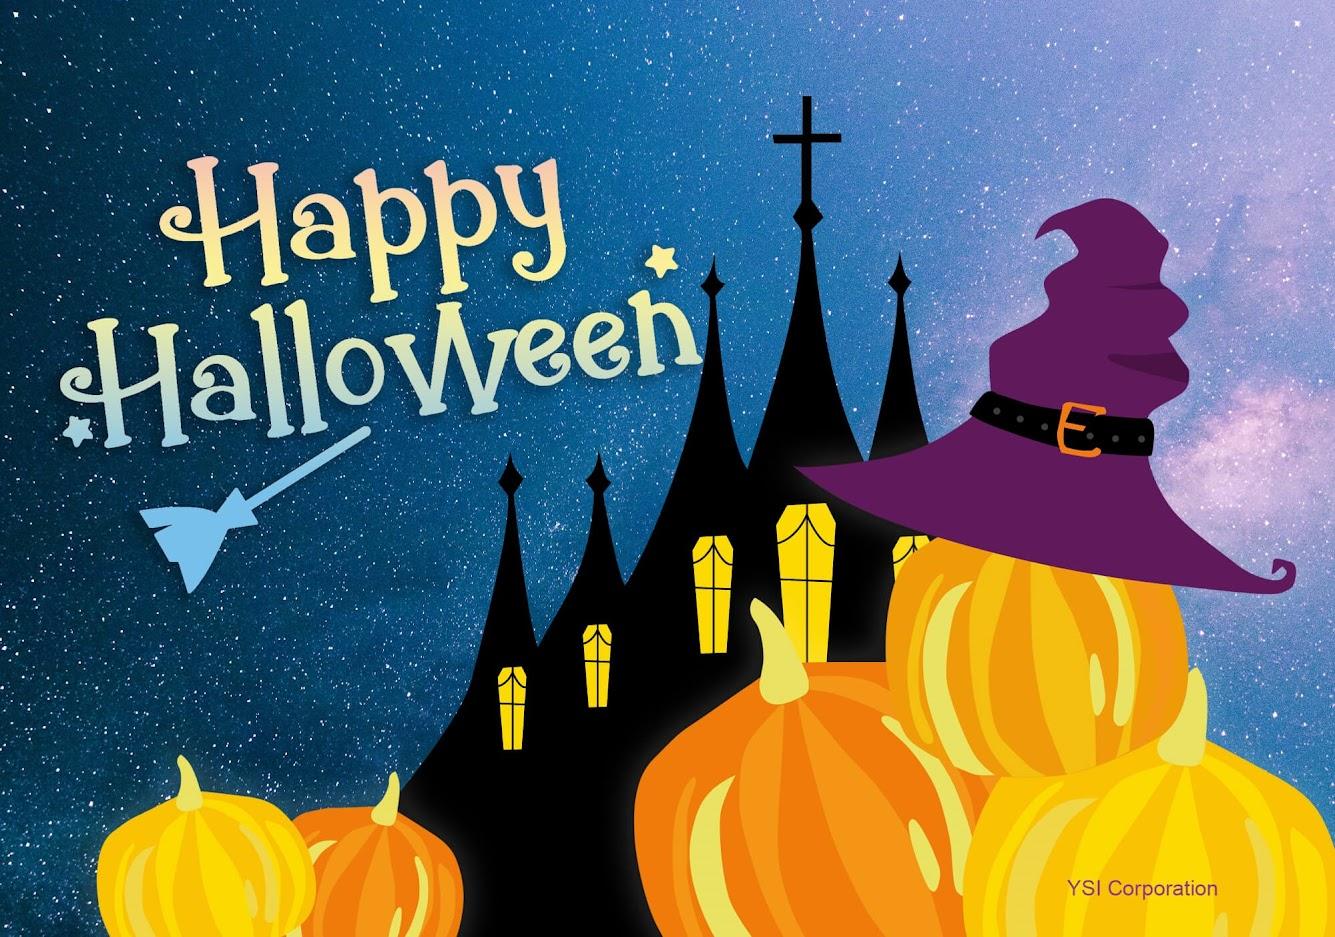 Trick or treat? Enjoy this spellbinding Halloween!